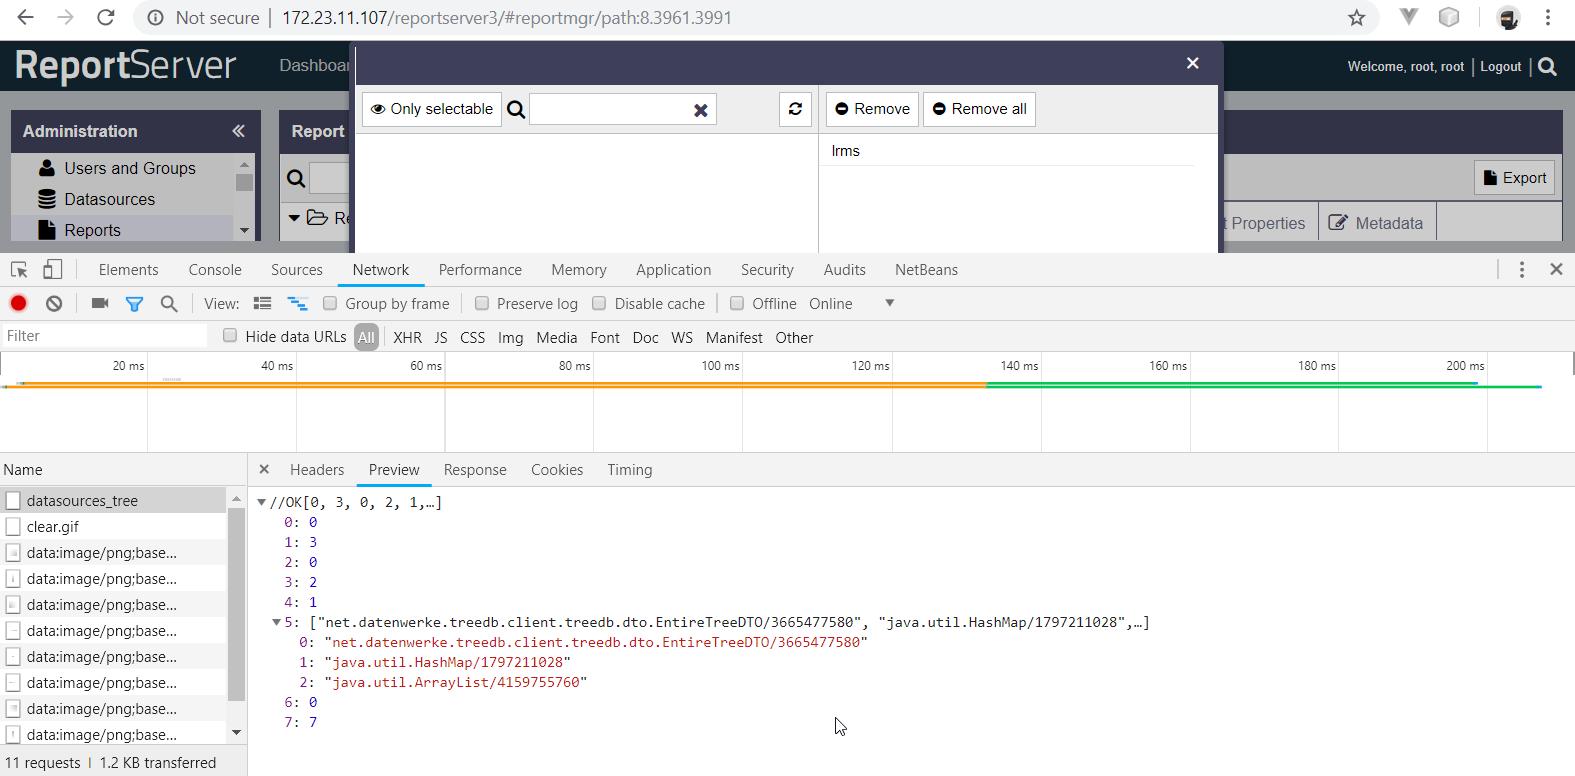 Deploys to JBoss EAP 7 1 5GA Error Found (Page 1) / ReportServer (EN